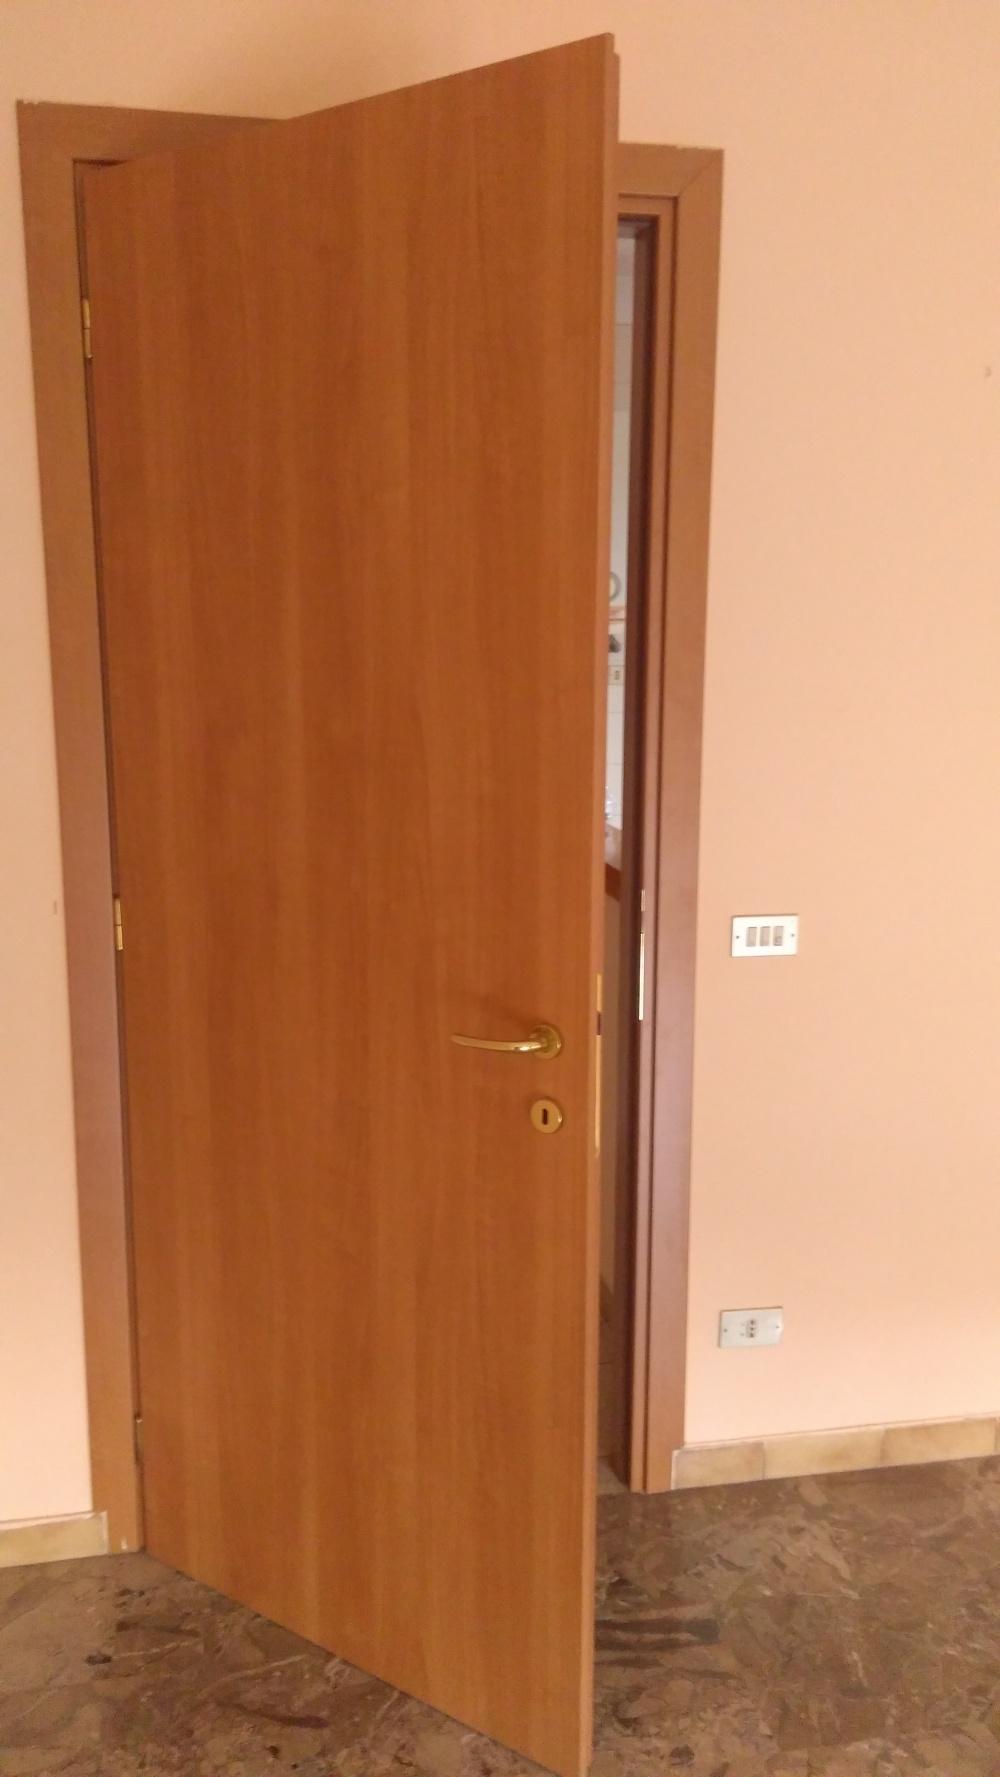 bellissime porte d'interno